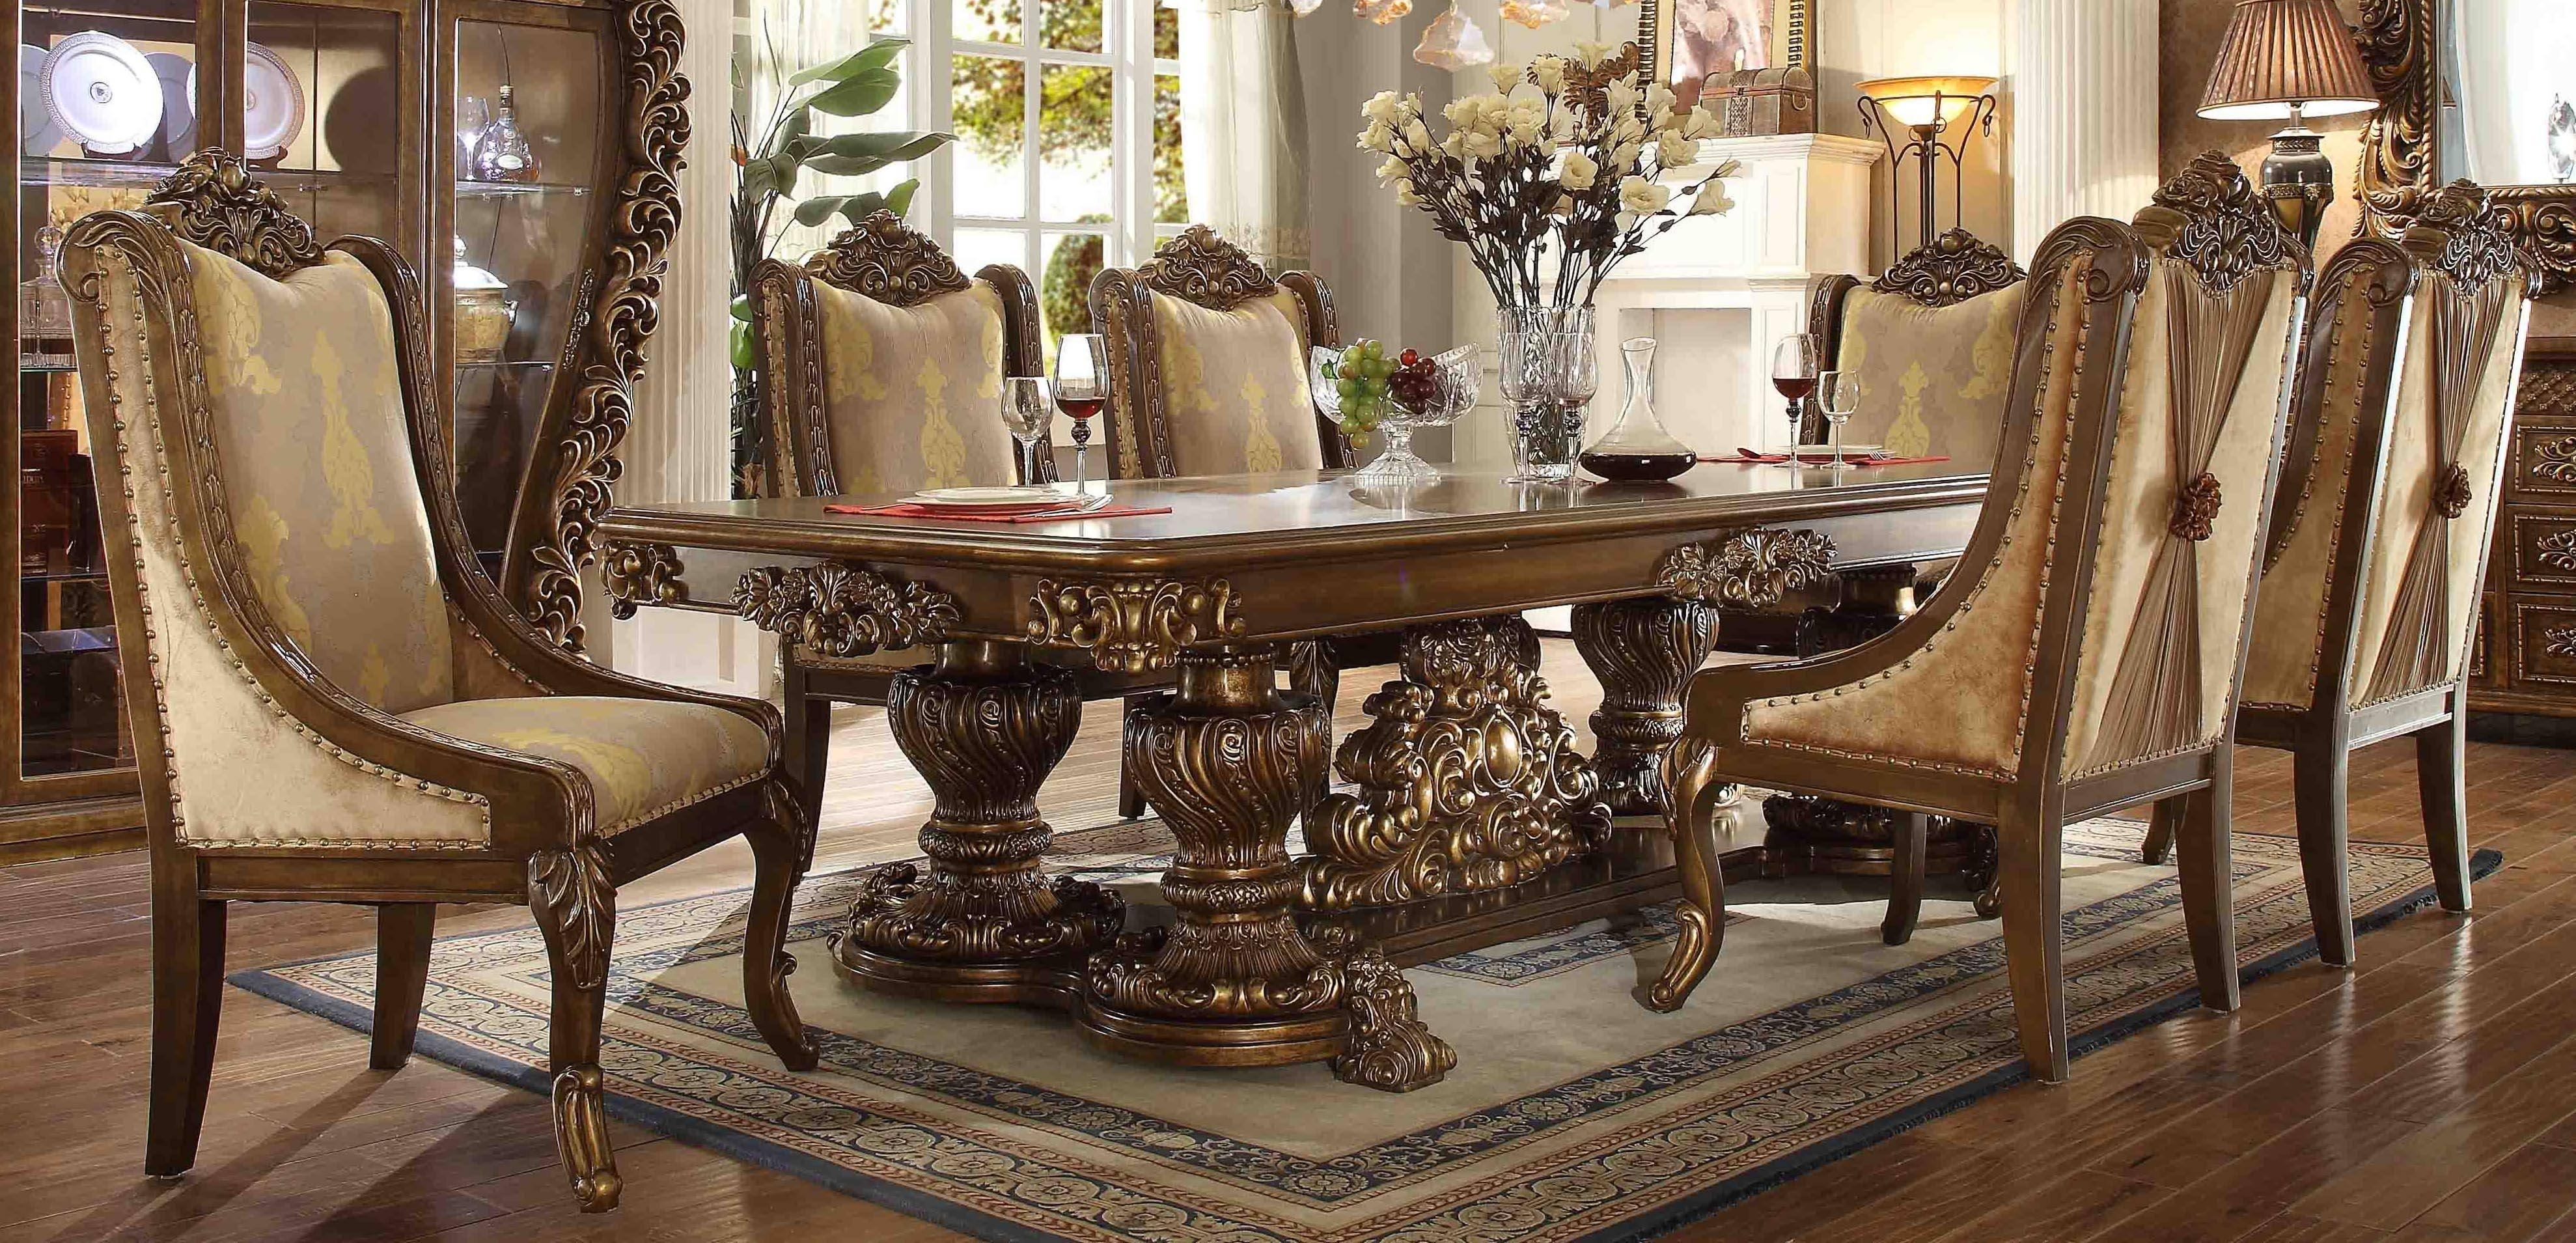 Buy Homey Design Hd 8011 Dining Table Set 7 Pcs In Walnut Cream Gold Finish Fabric Online